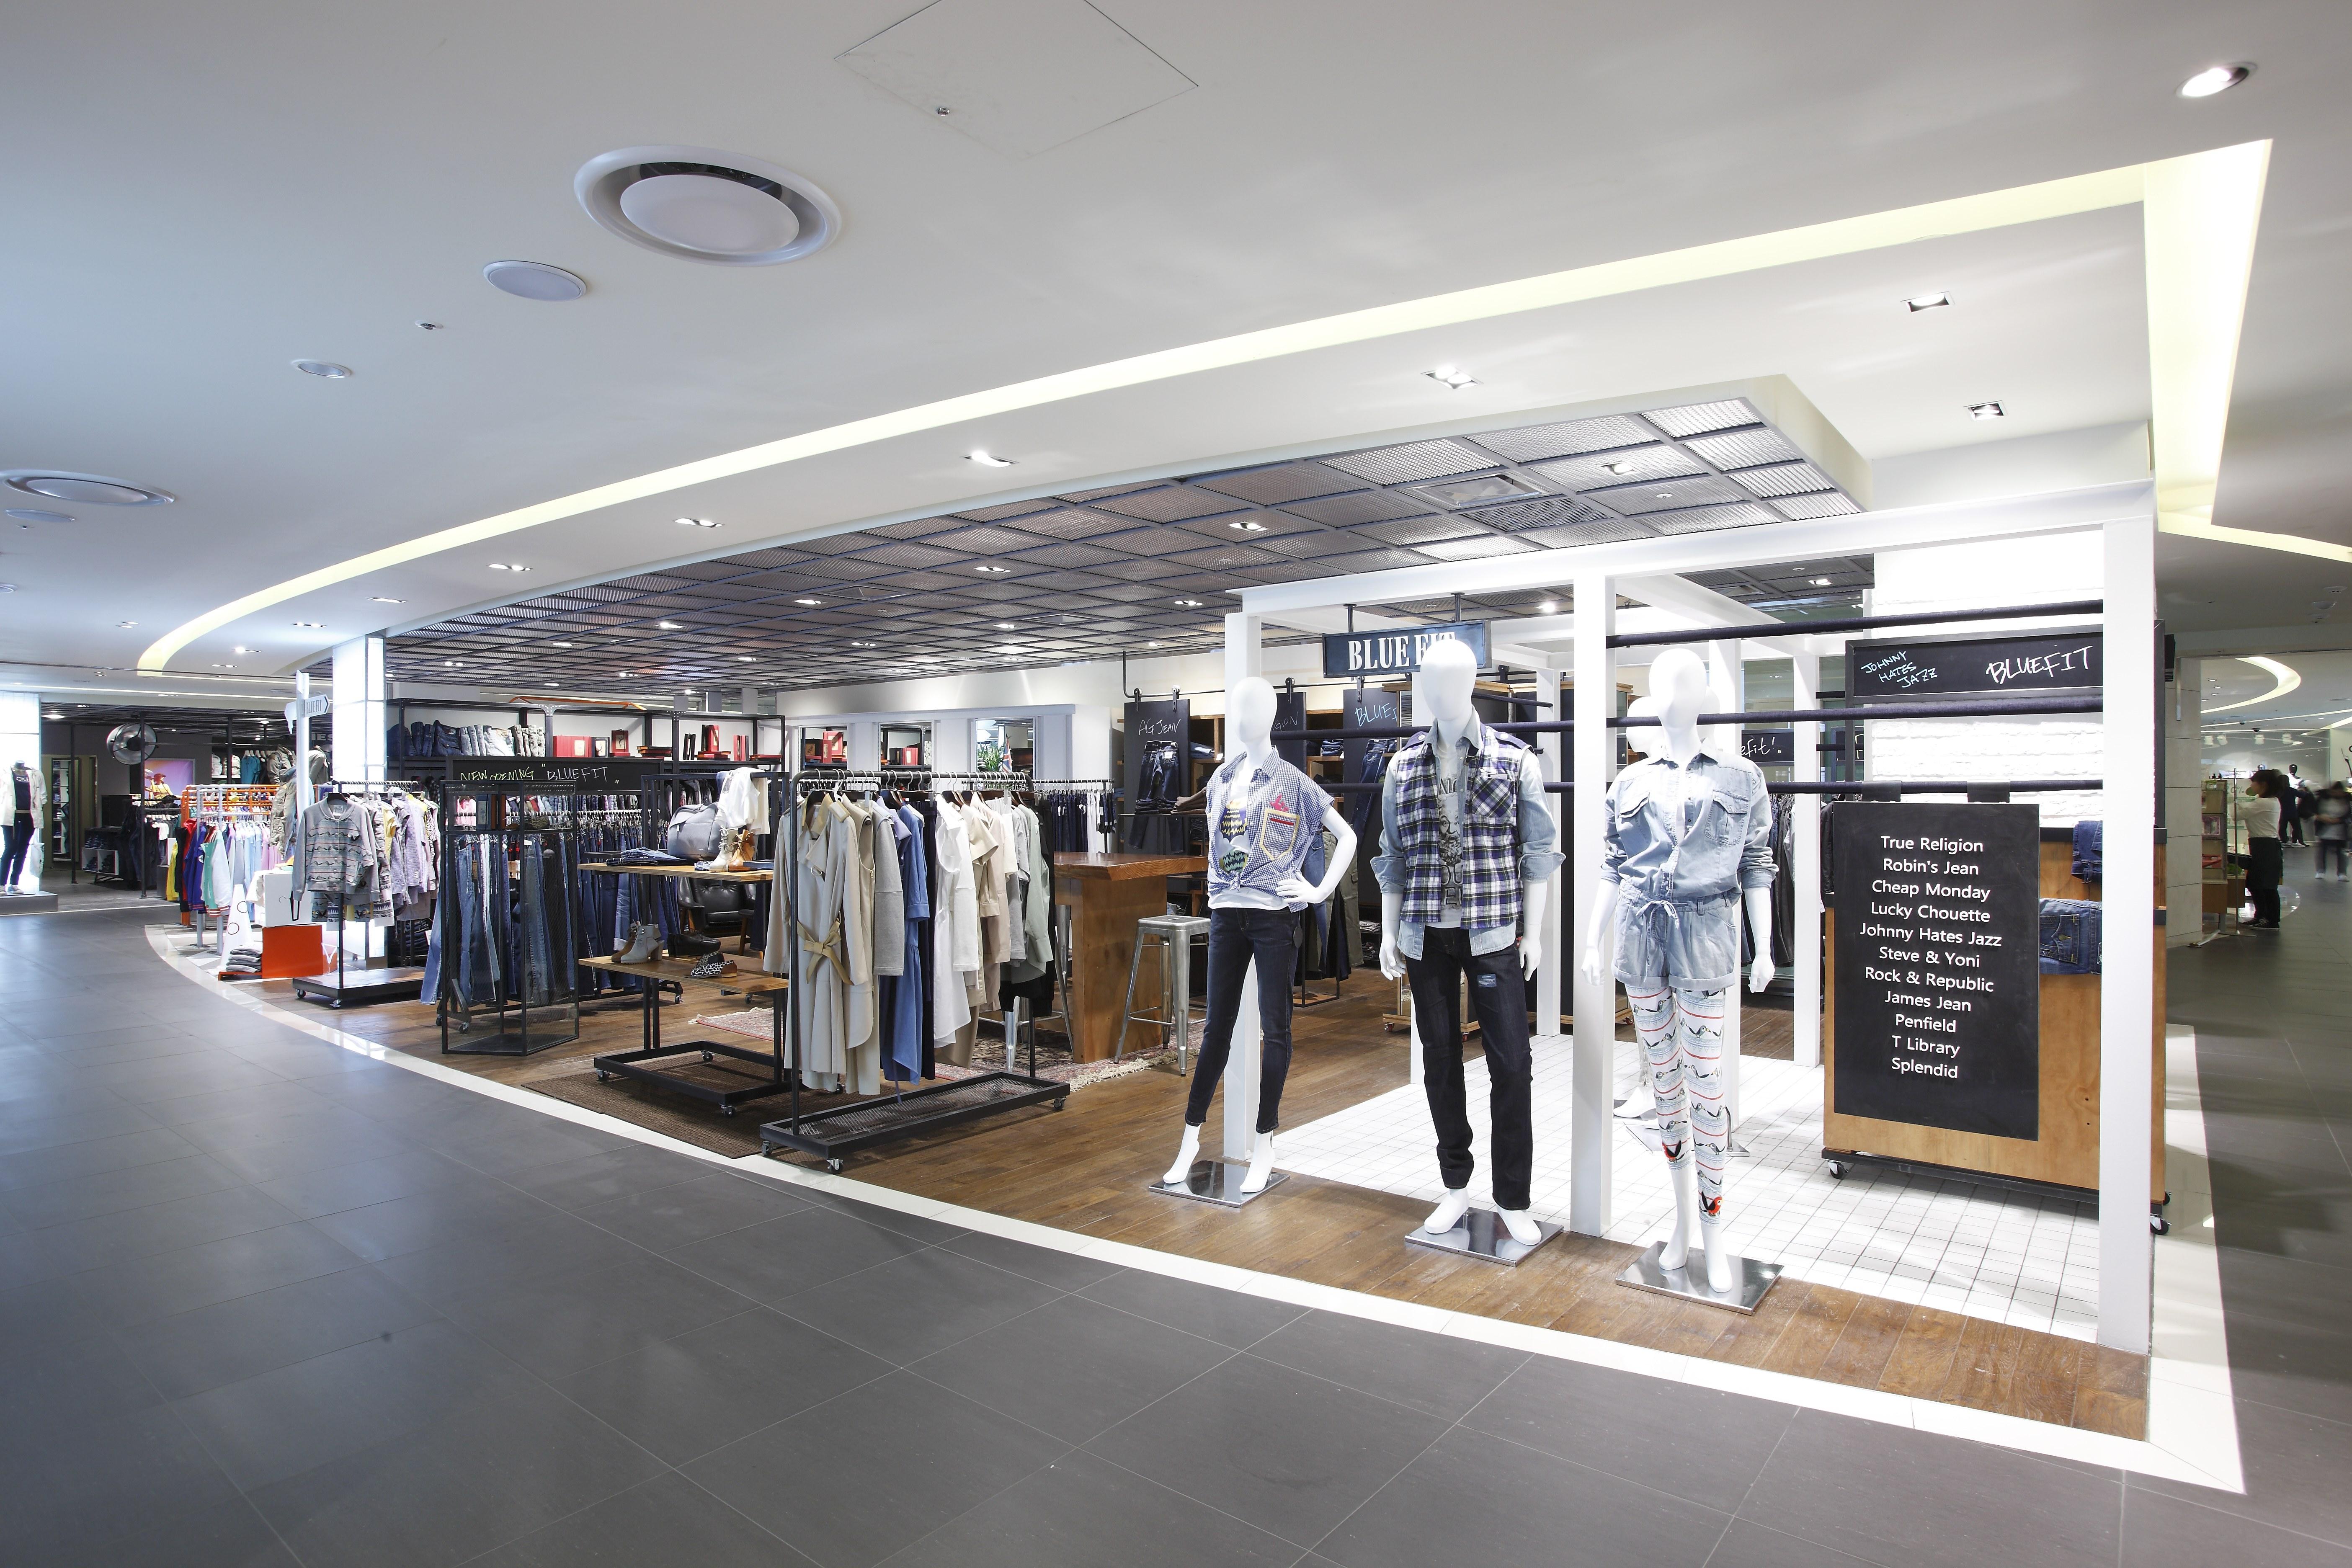 Superieur Shinsegae Department Store In Incheon, South Korea. Interior Design By  Barriscale Design Studio.retail Floor ...